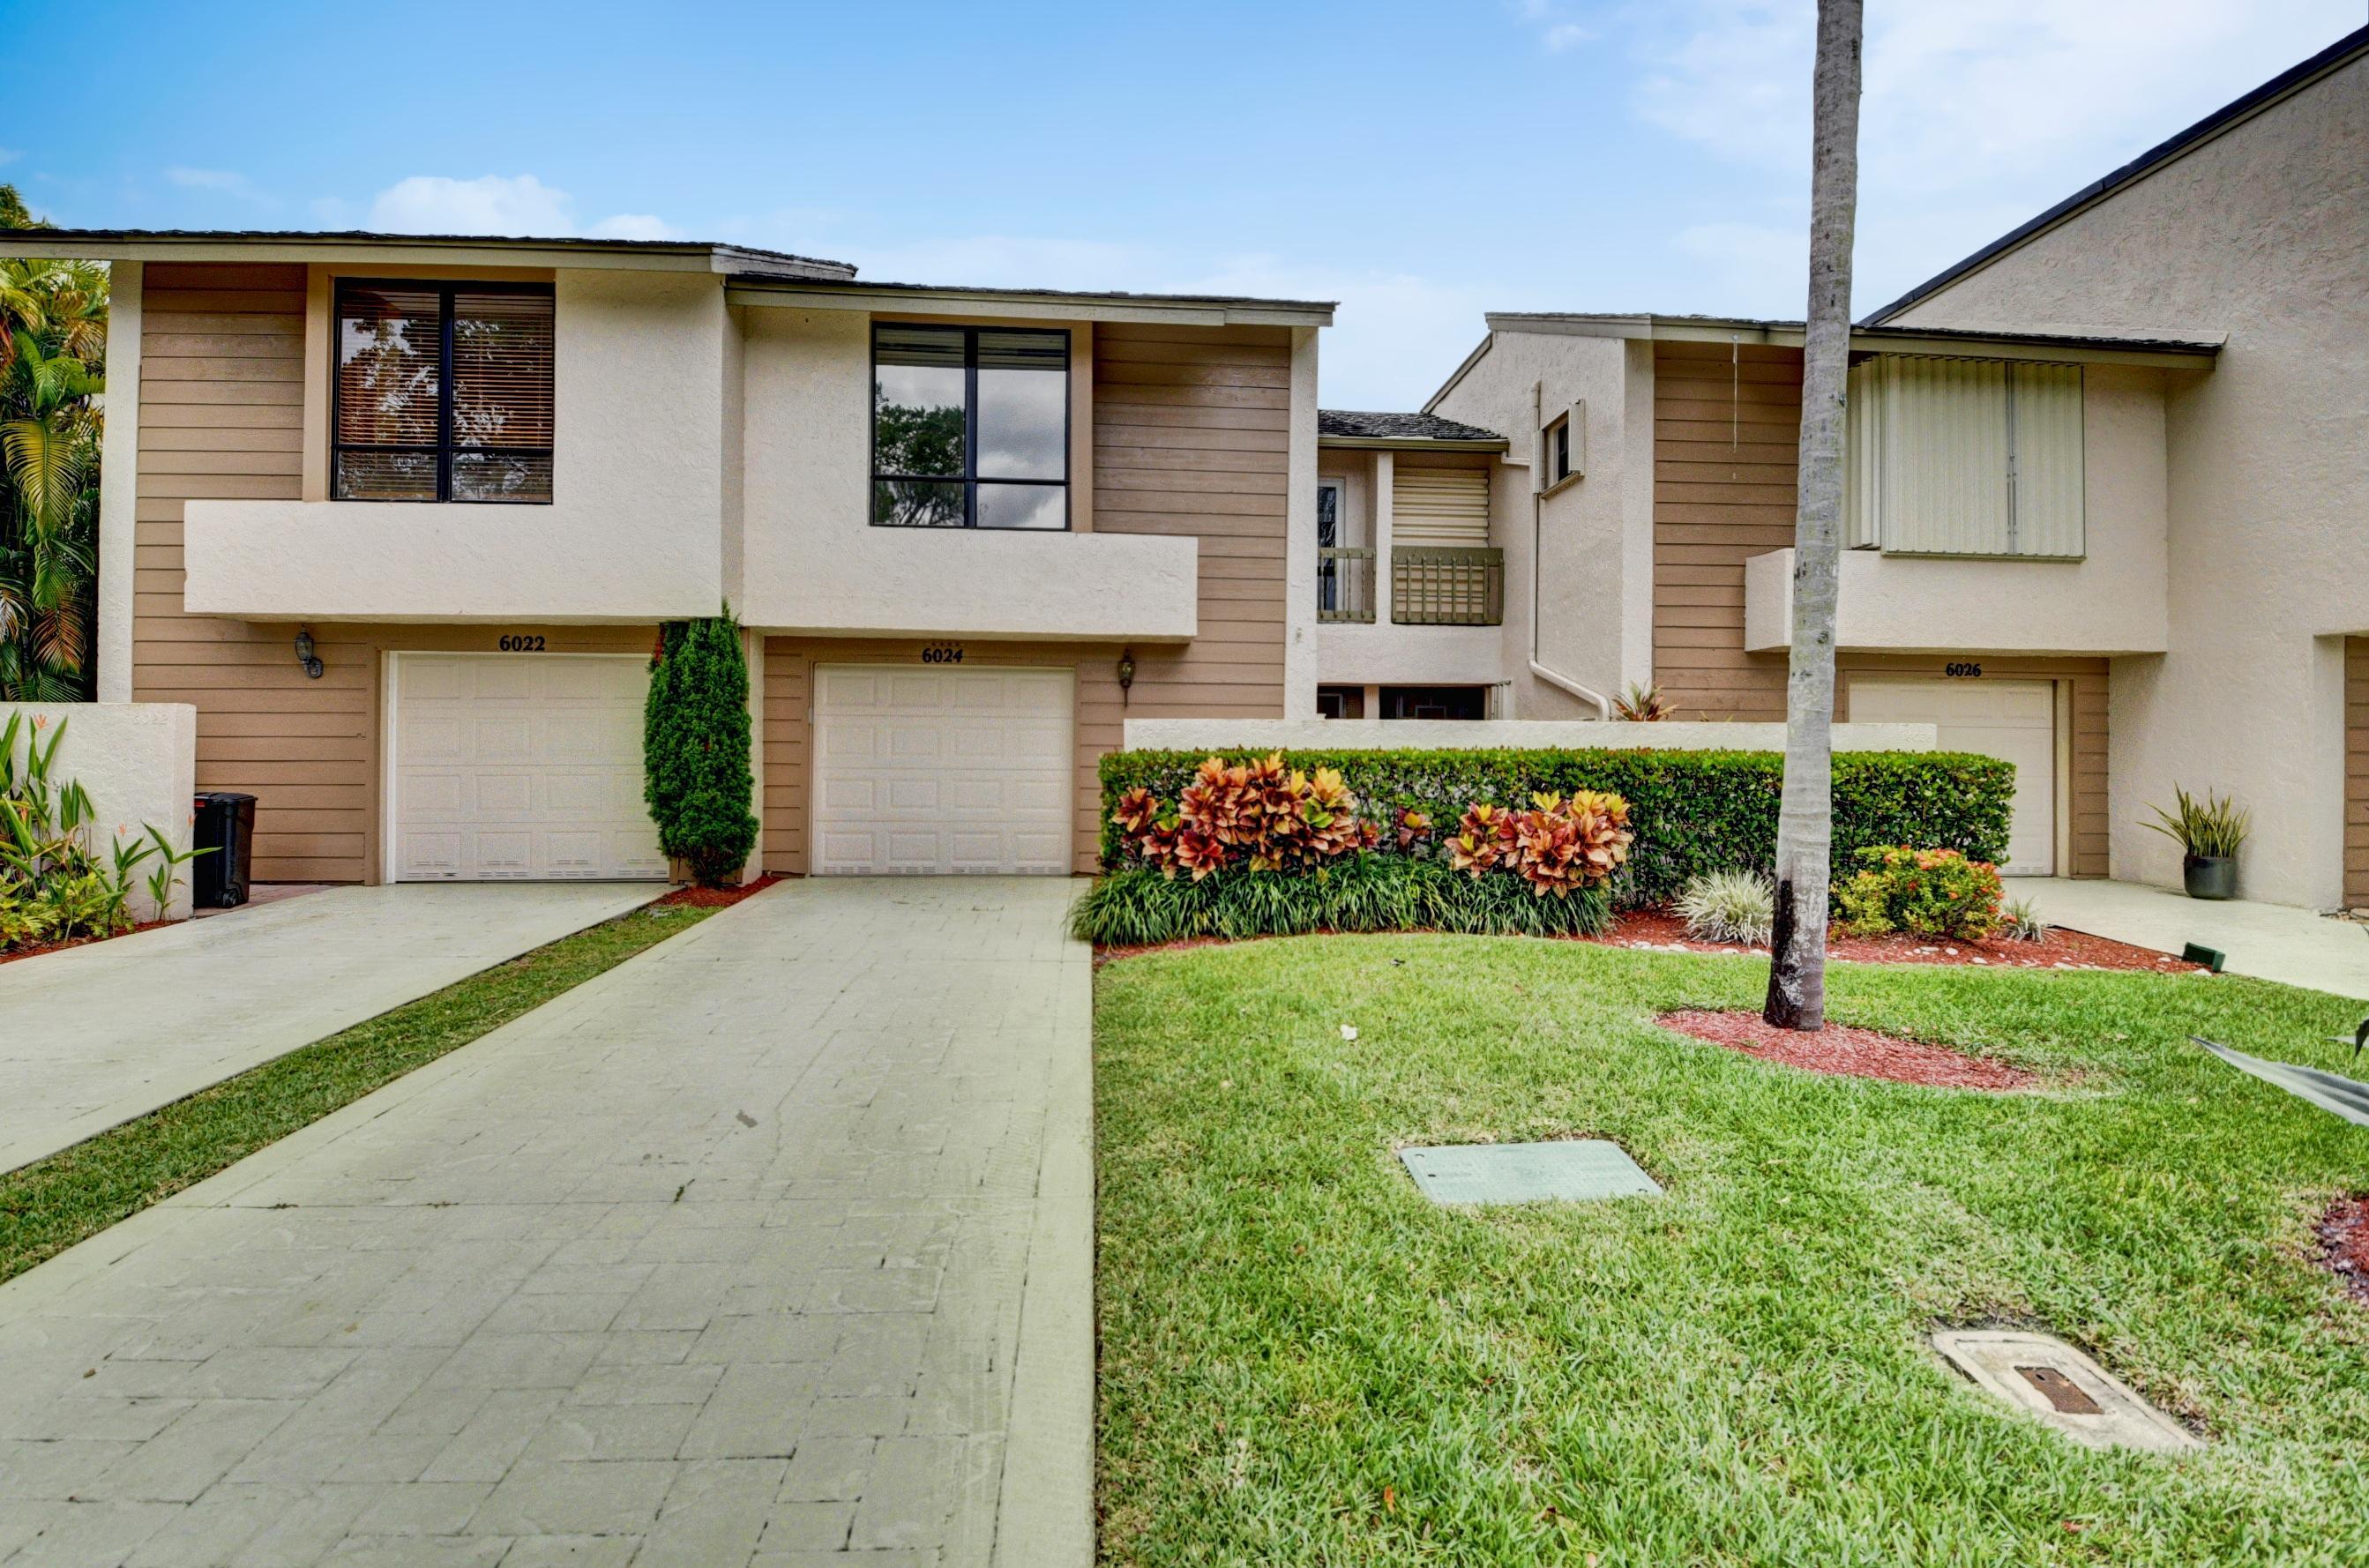 6024 Glendale Drive Boca Raton, FL 33433